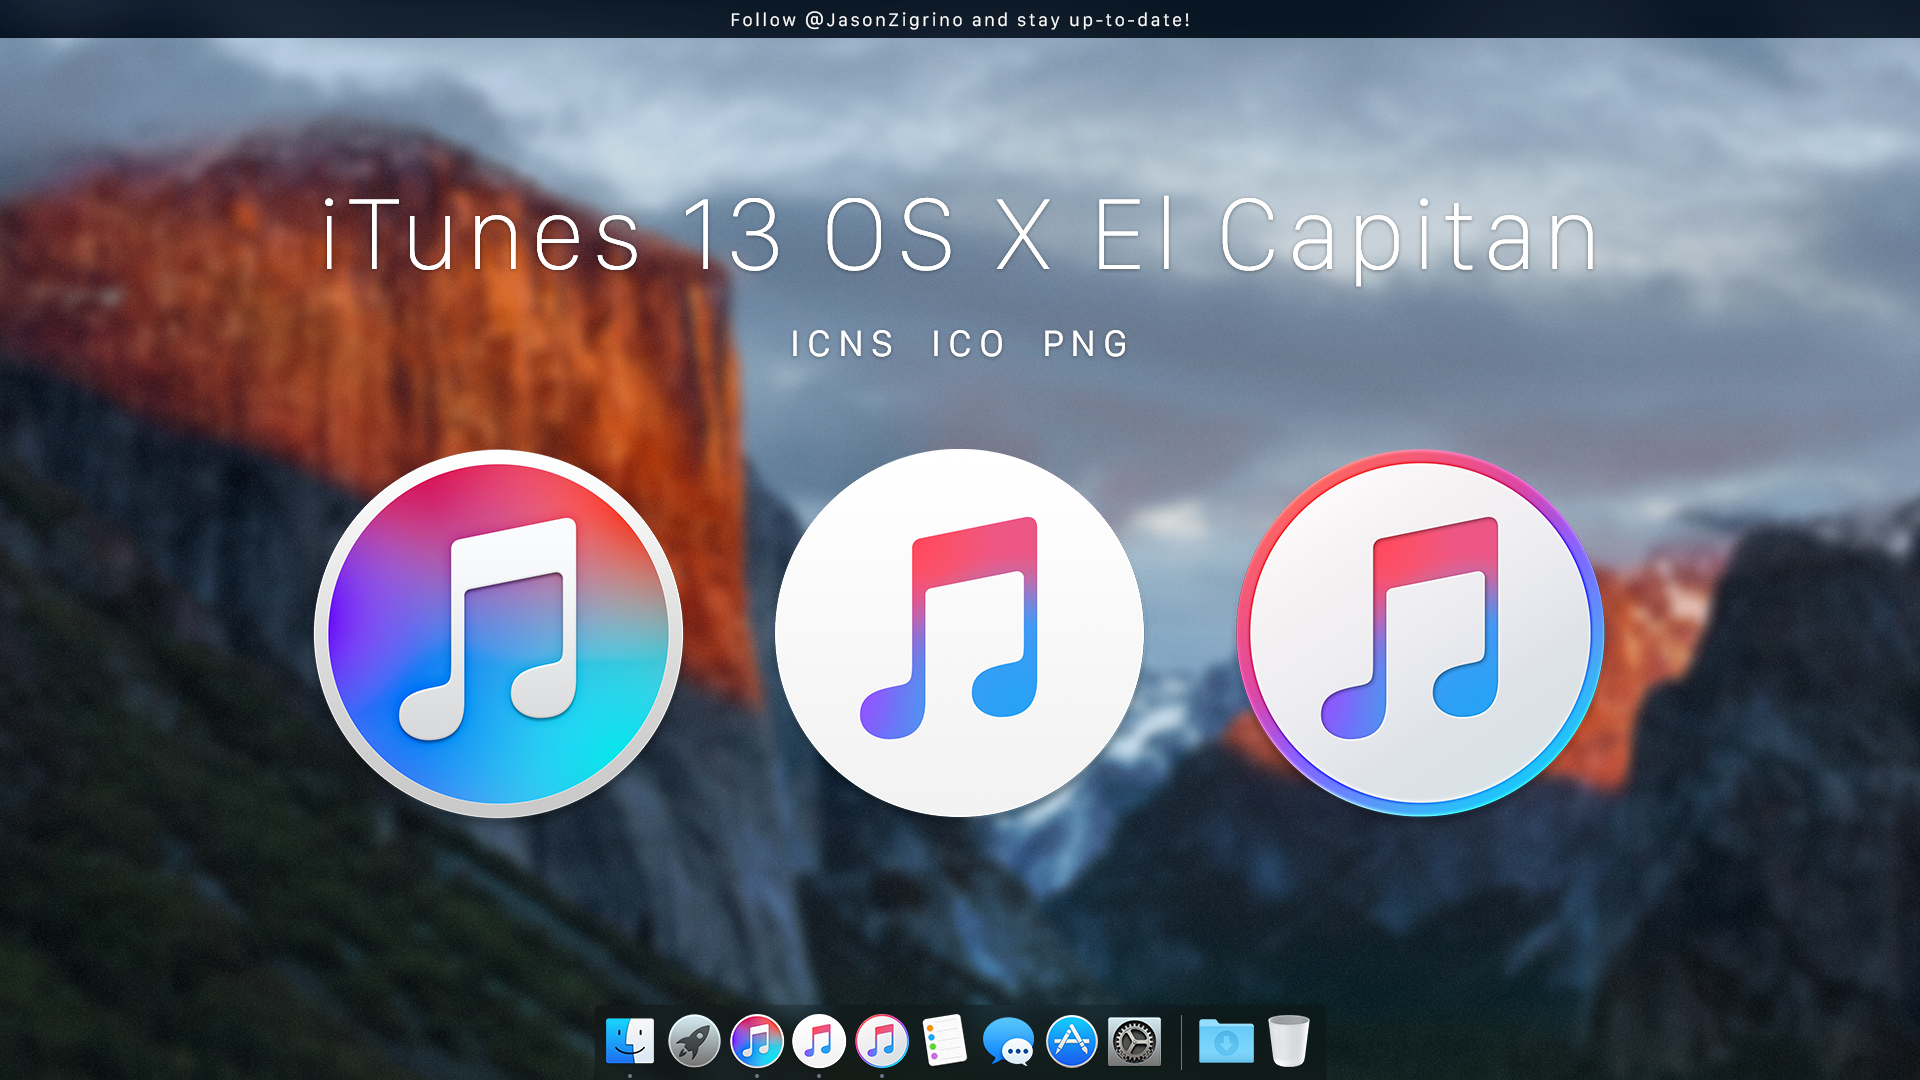 iTunes 13 El Capitan by JasonZigrino